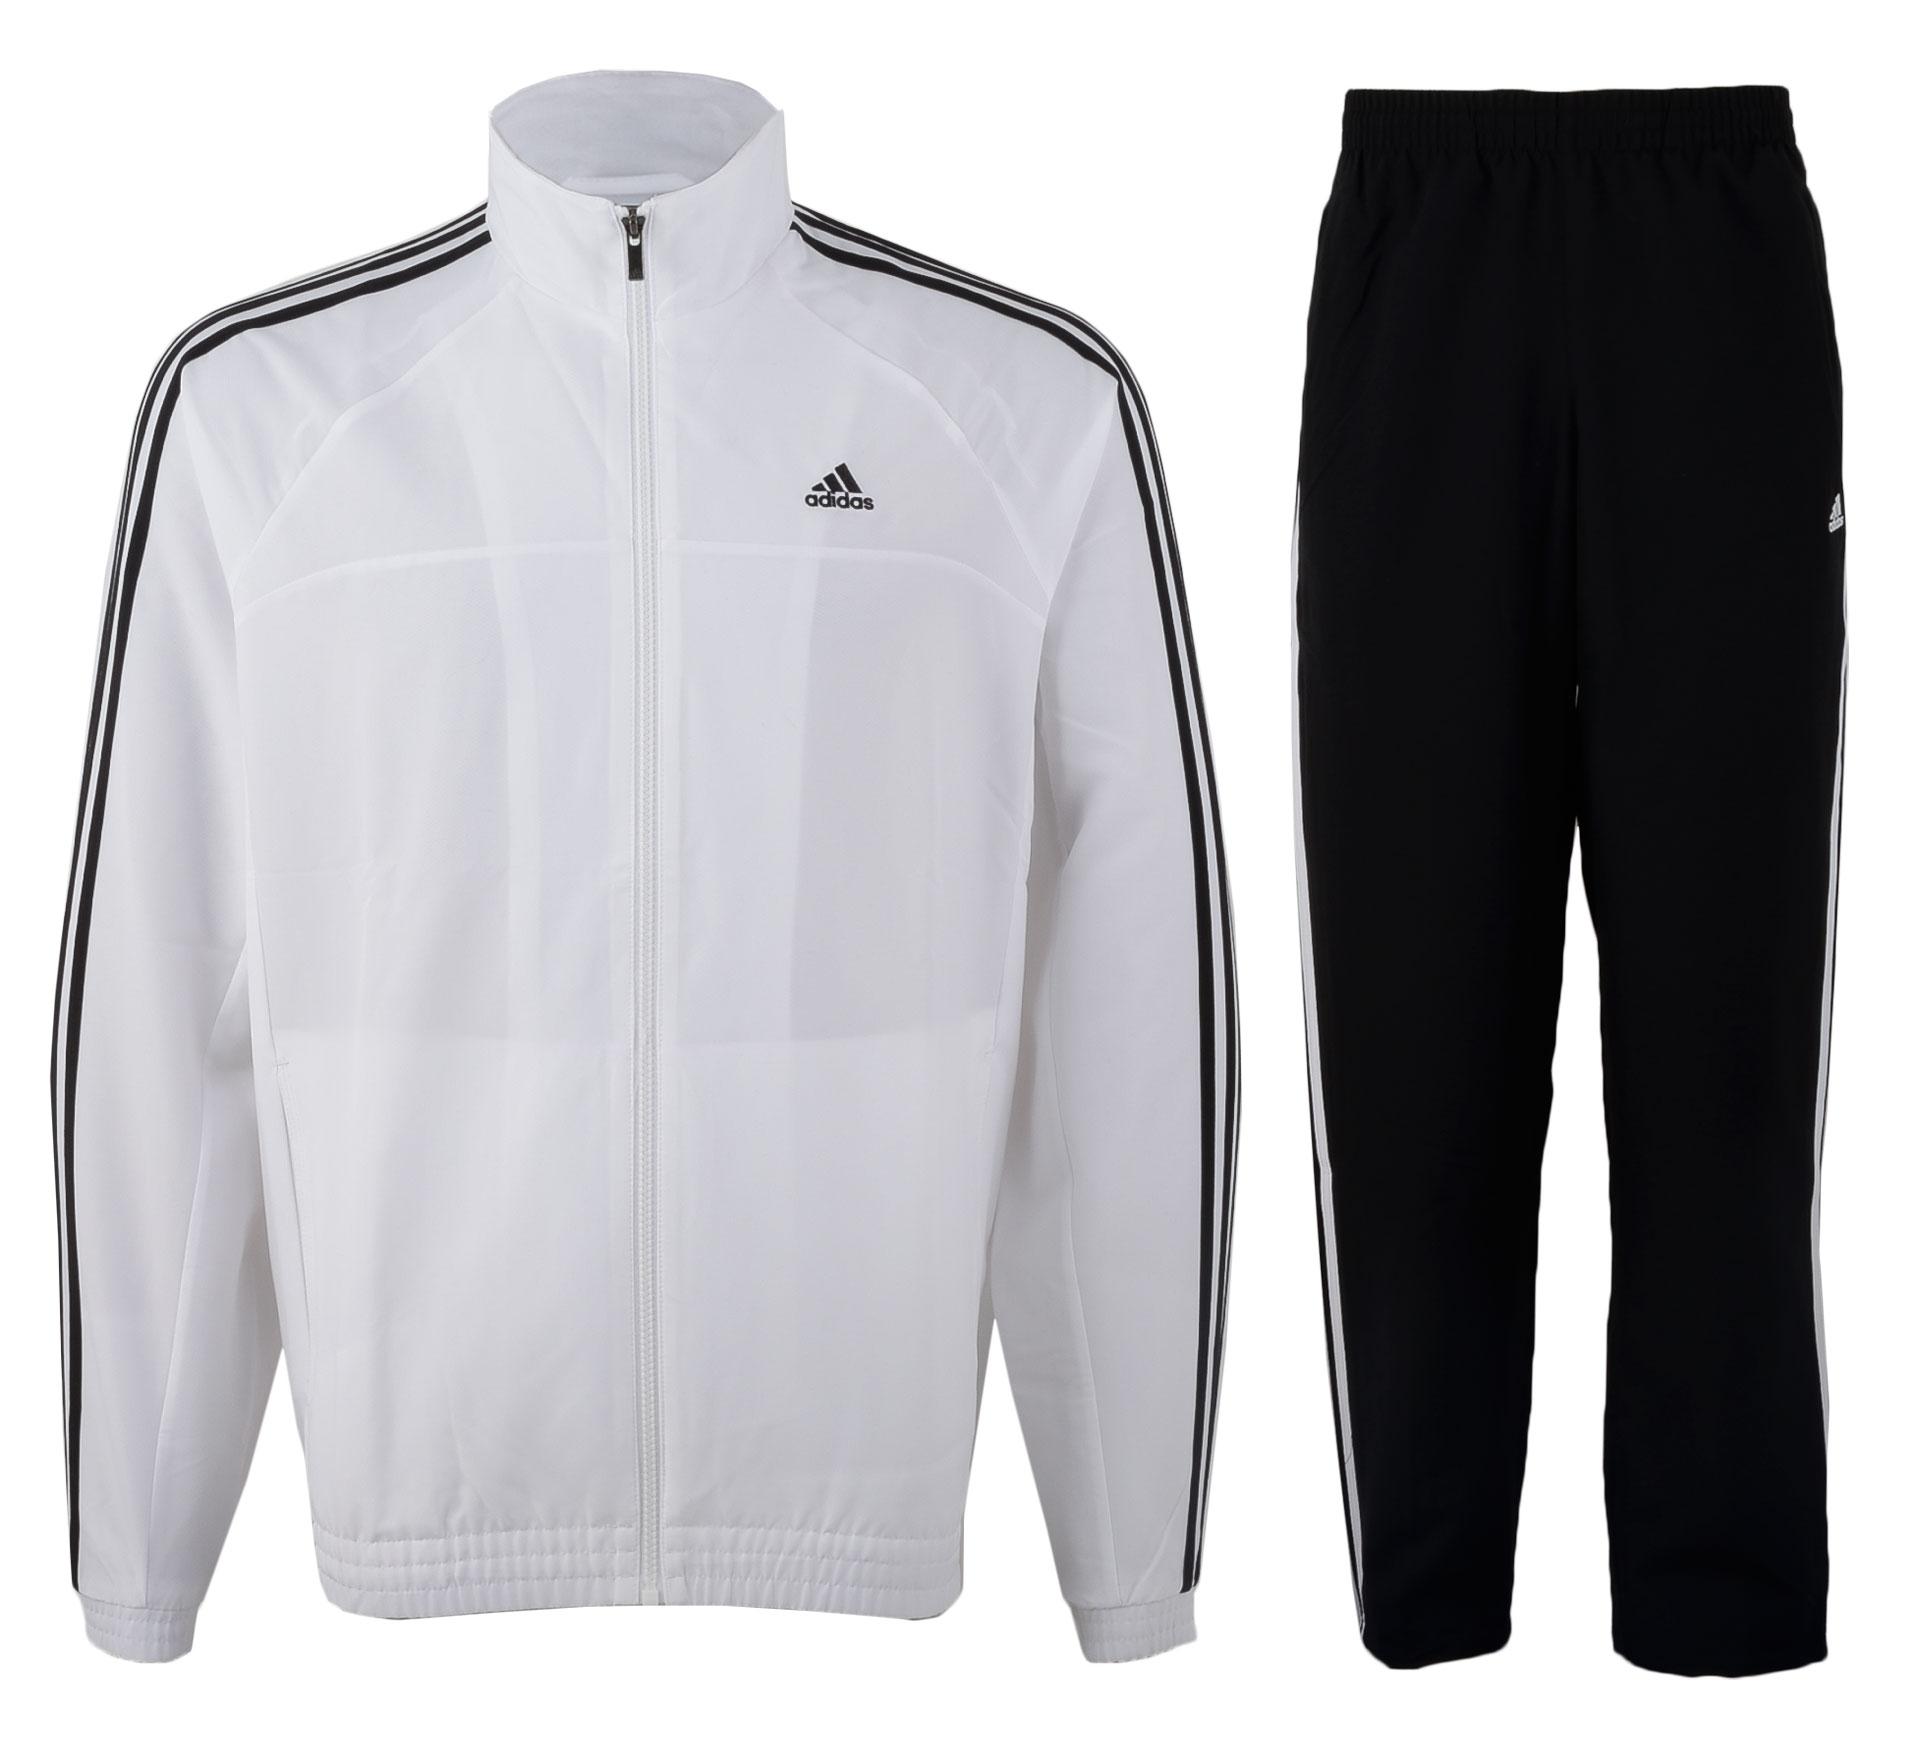 Adidas Essentials 3Stripe Woven laagste prijs? Vergelijk